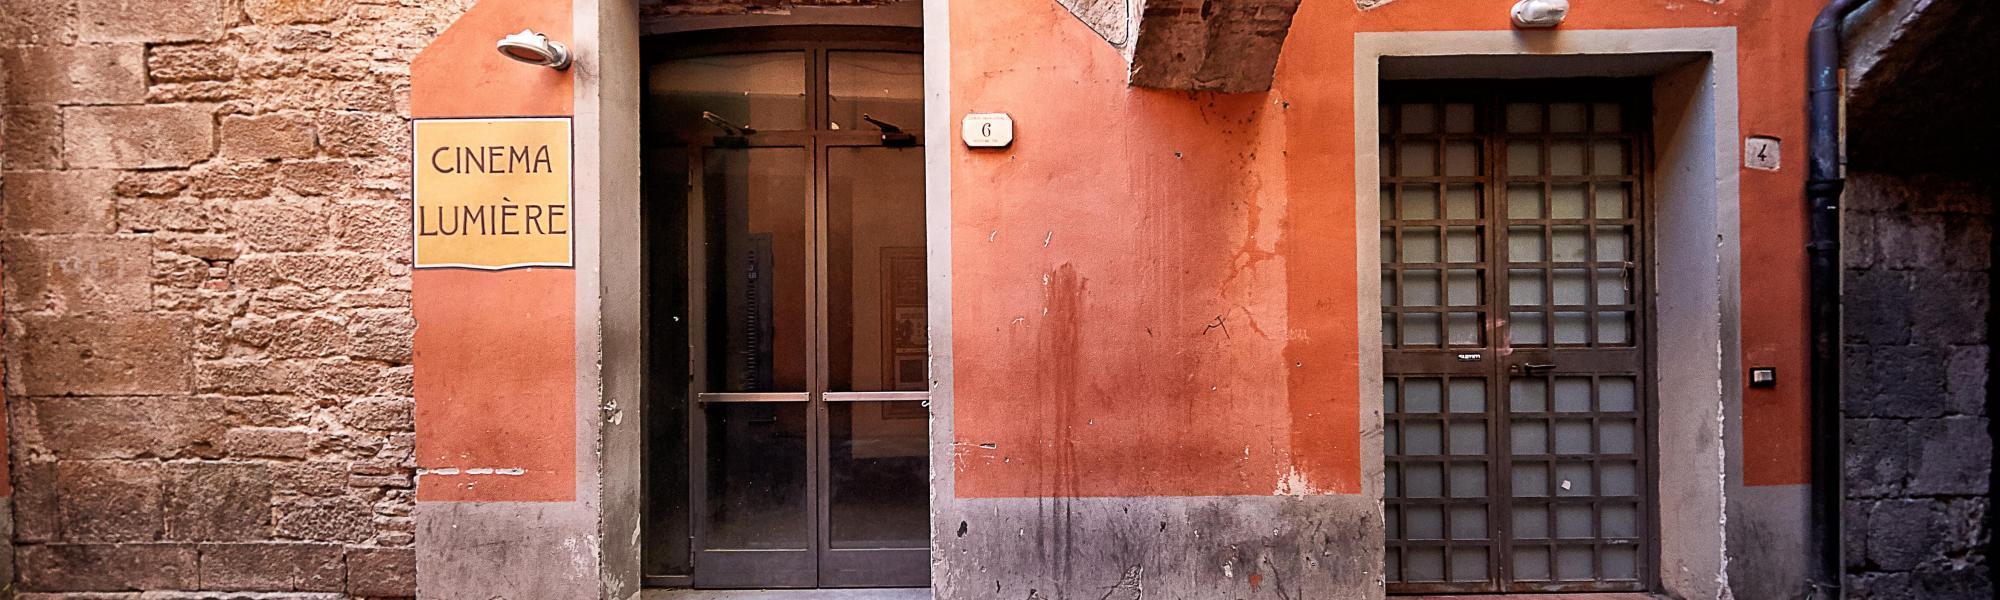 Cinema Lumiere, facciata (M. Cerrai, Comune di Pisa)